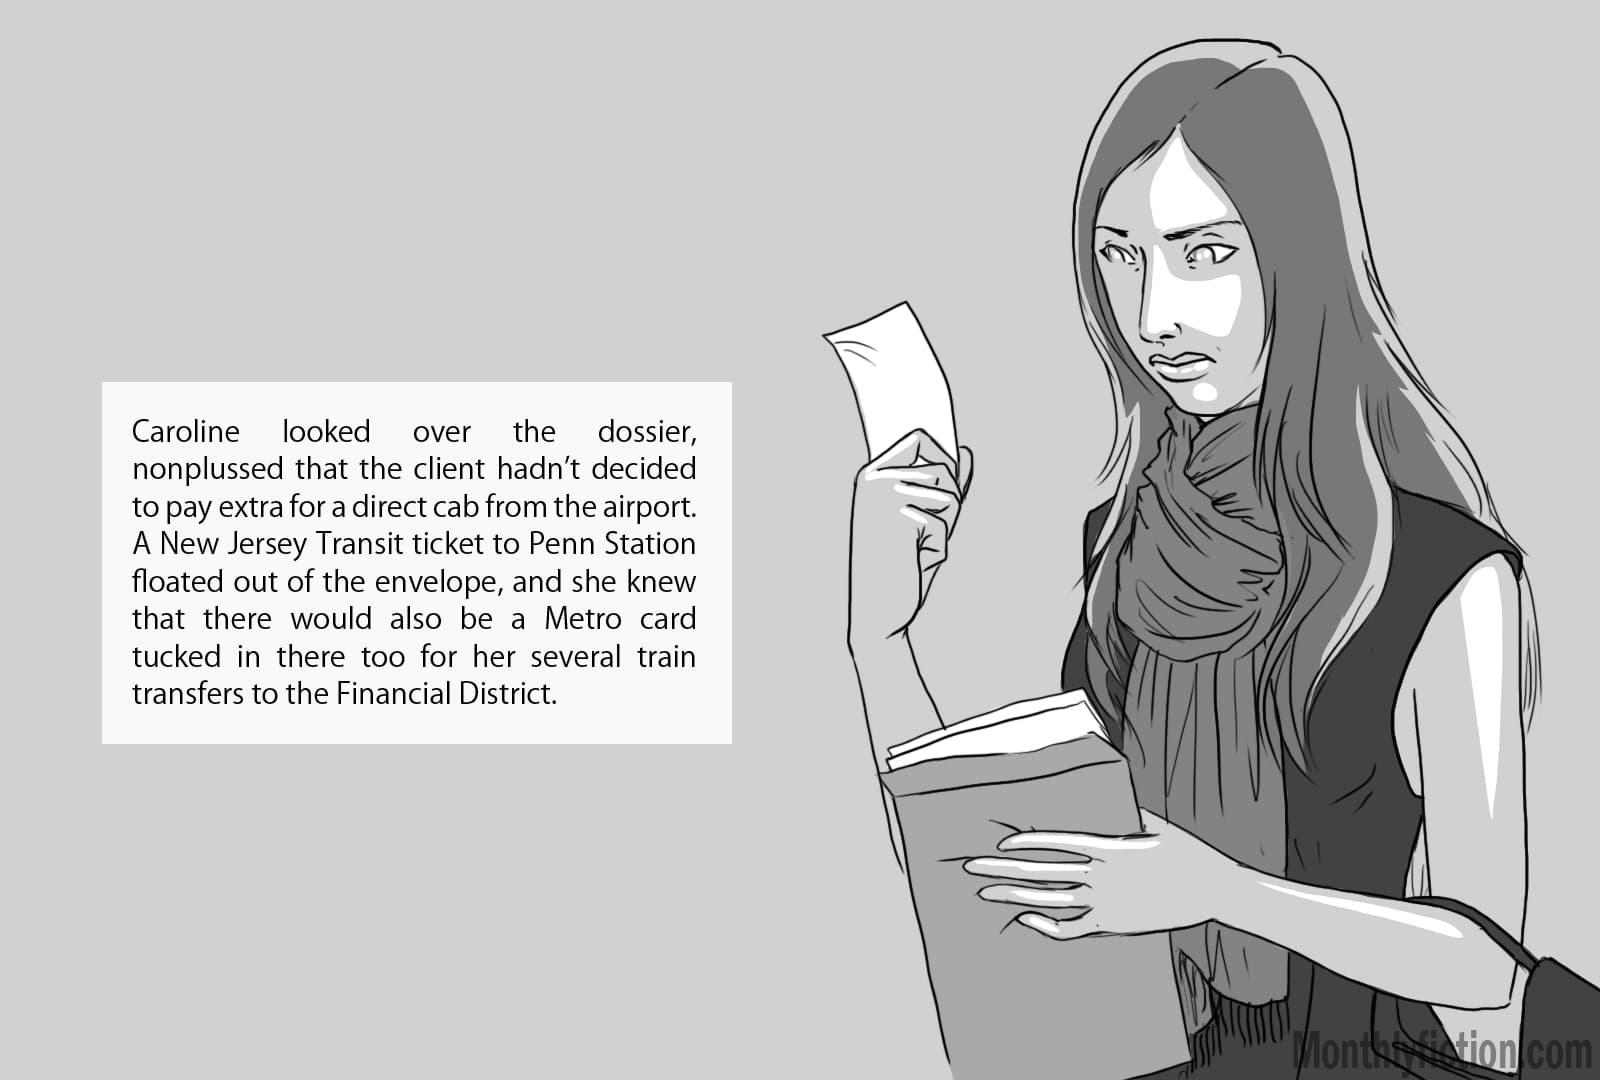 Monthly Fiction Takeoffs and landings illustration illustraded story deborah burke camilo sandoval page 23